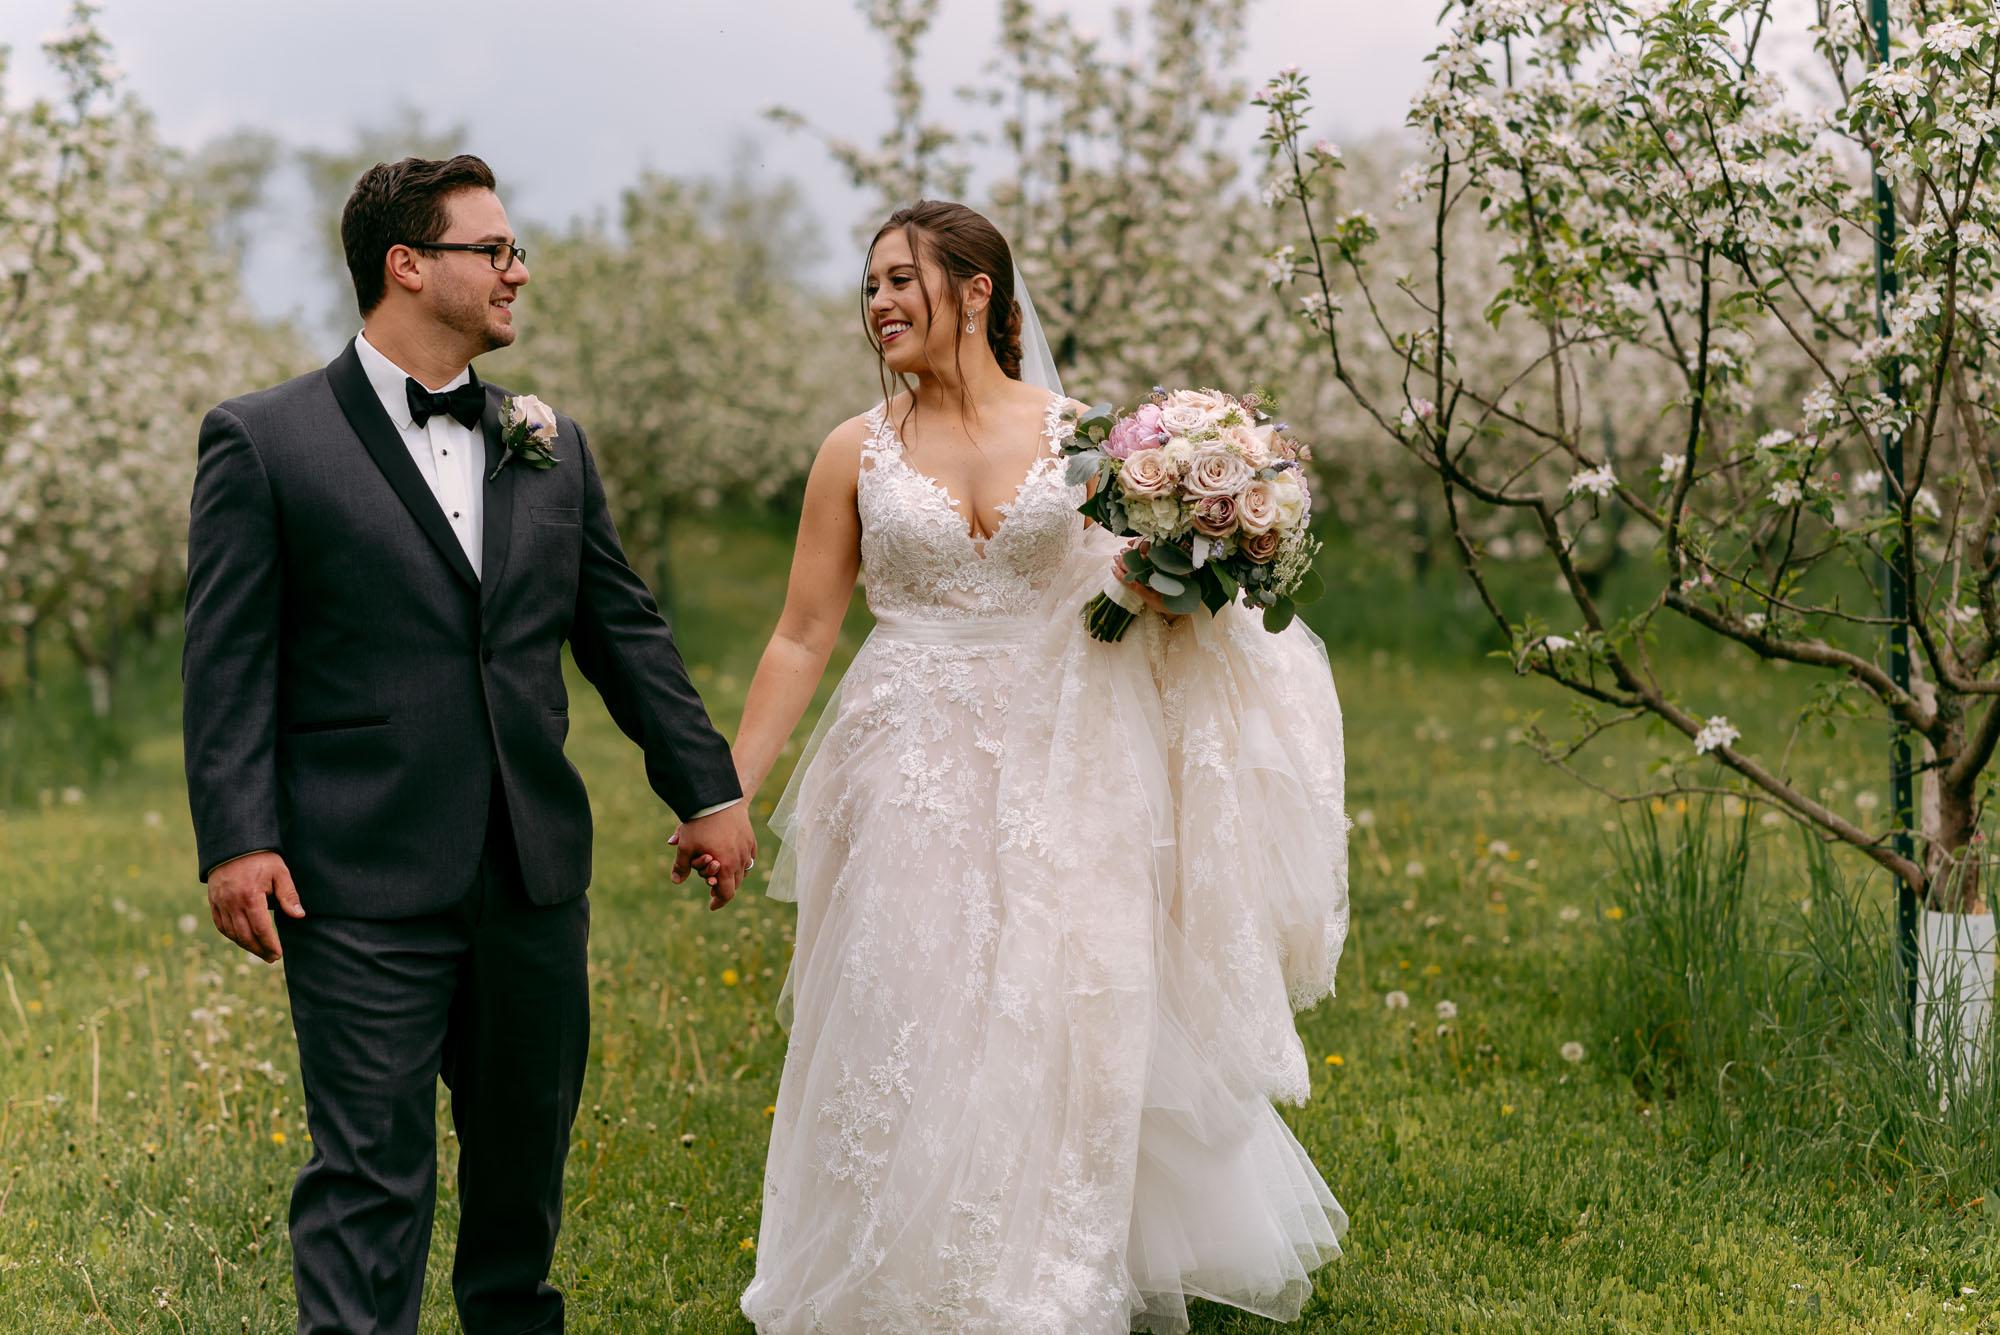 orchard-ridge-farms-pavillion-Rockton-IL-wedding-photographers-9.jpg